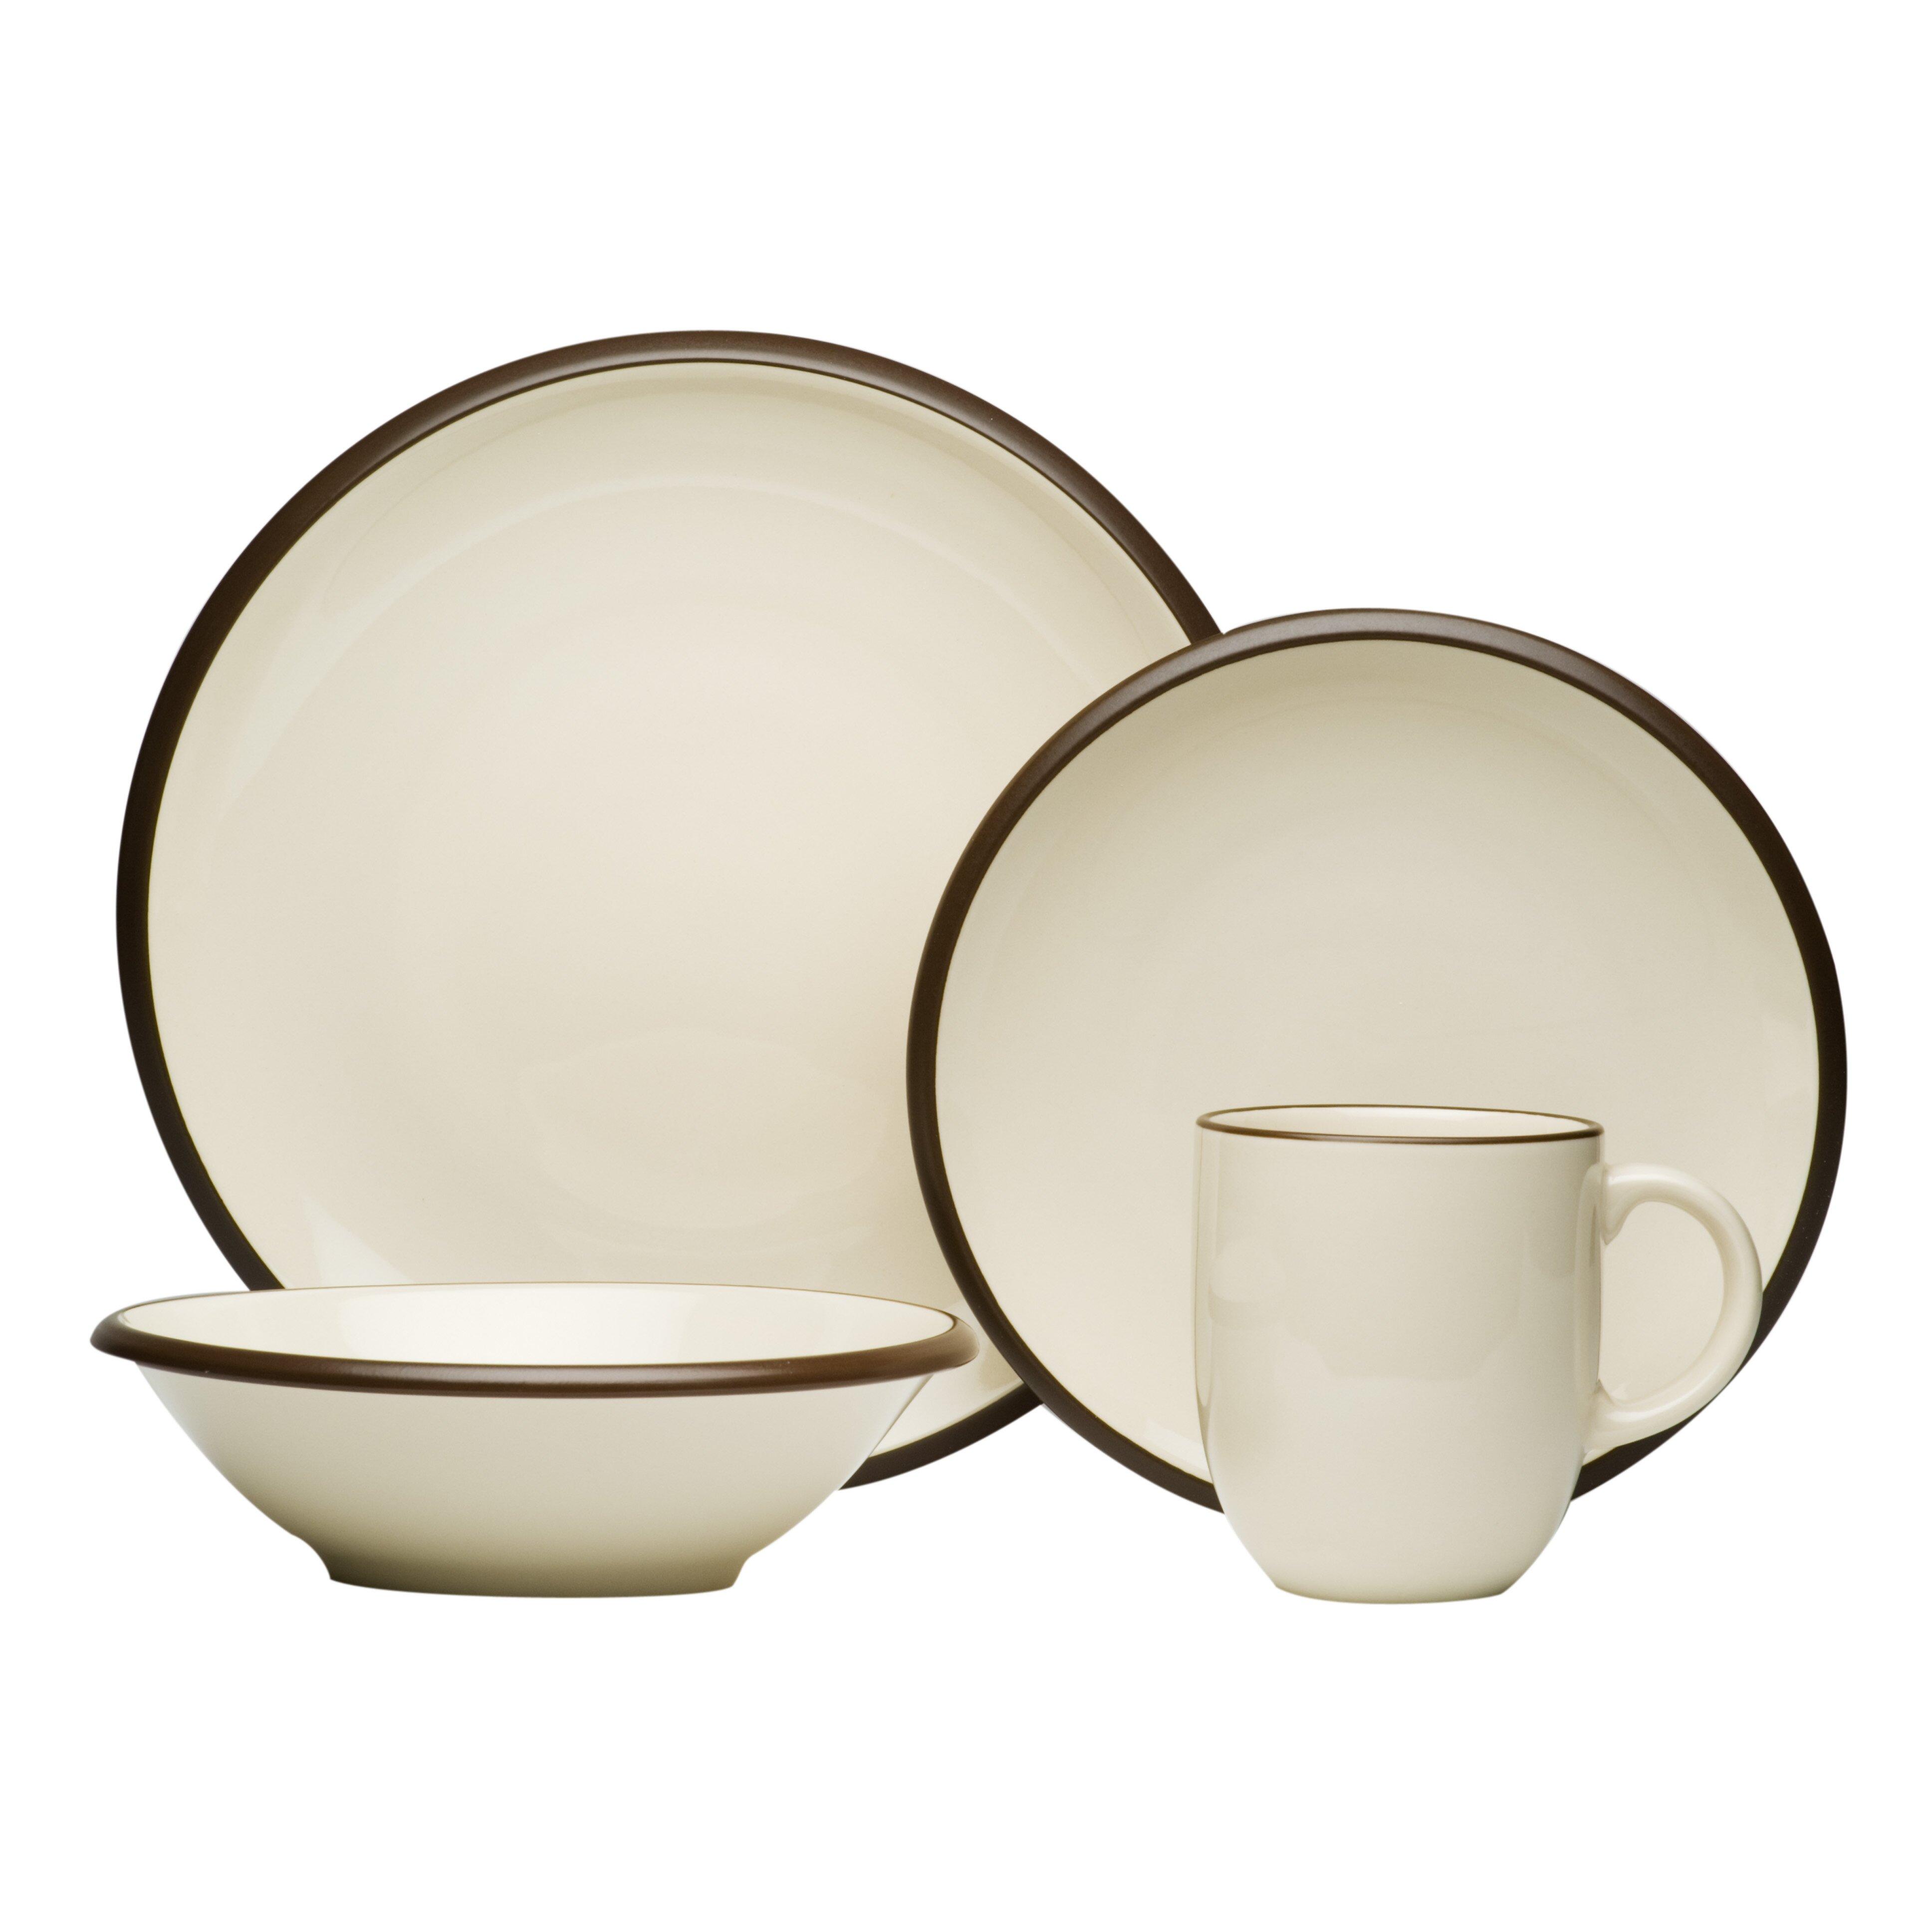 Pottery Barn Christmas Dinnerware